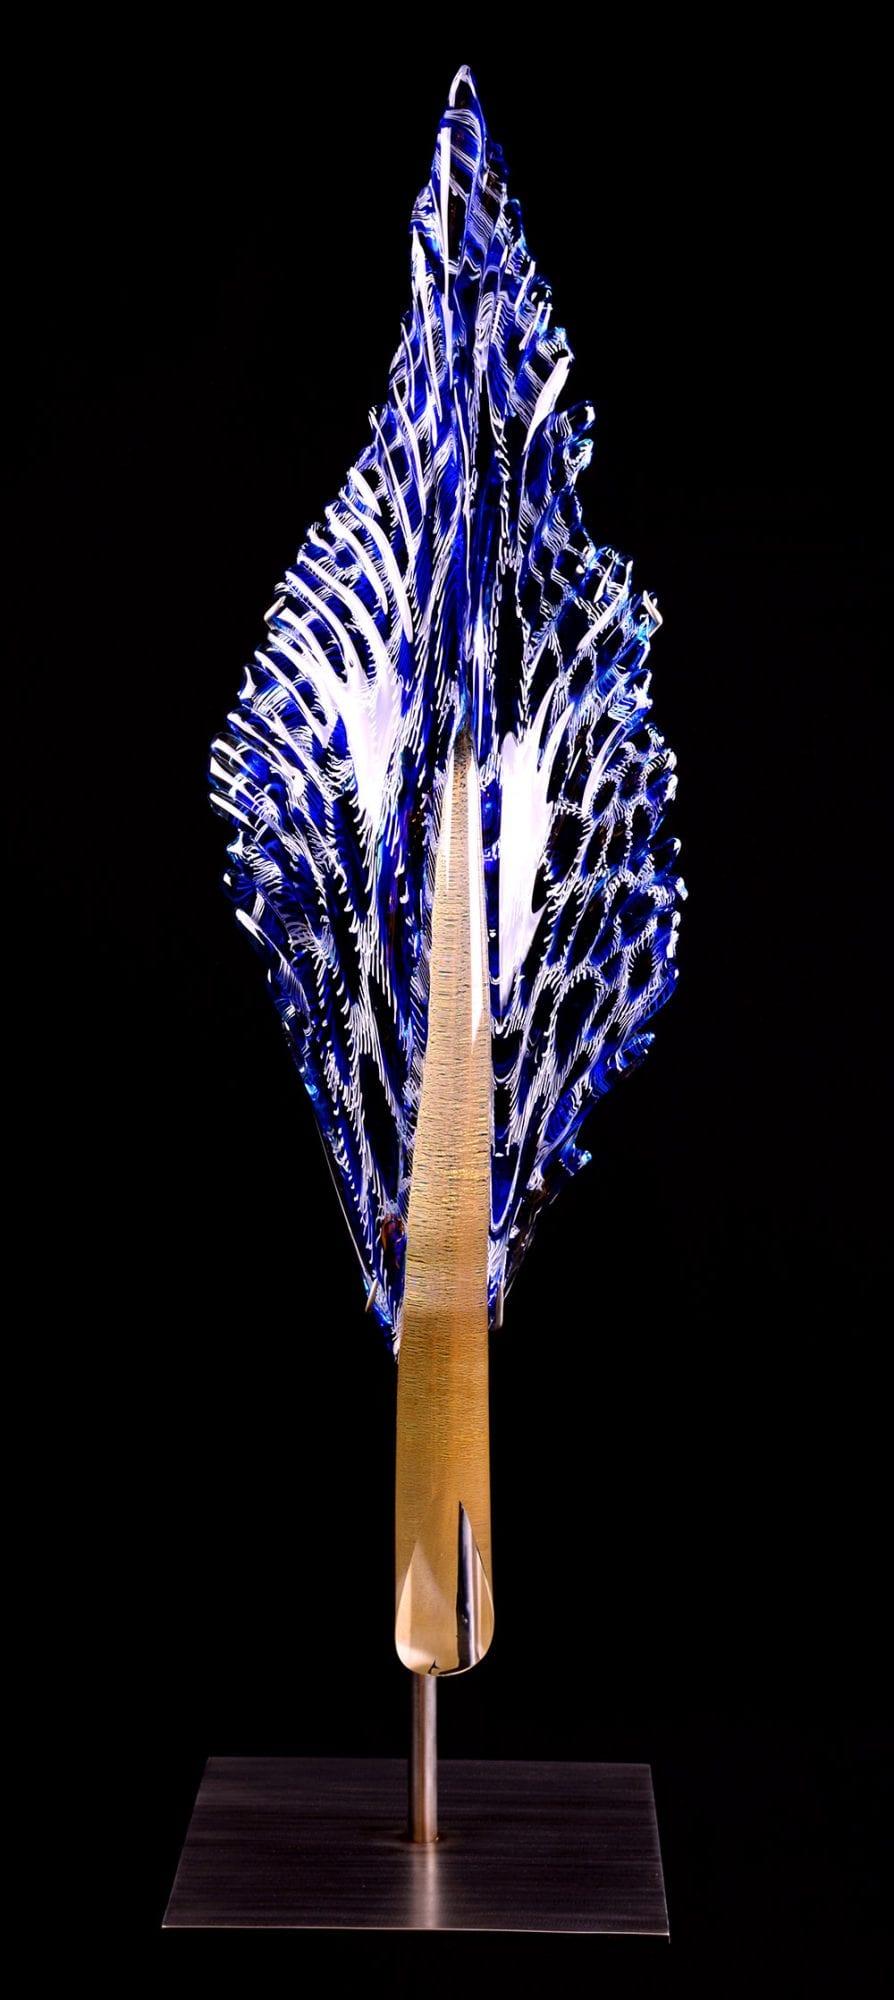 Cobalt Blue Starfire Feather | Nic McGuire | Sculpture-Exposures International Gallery of Fine Art - Sedona AZ